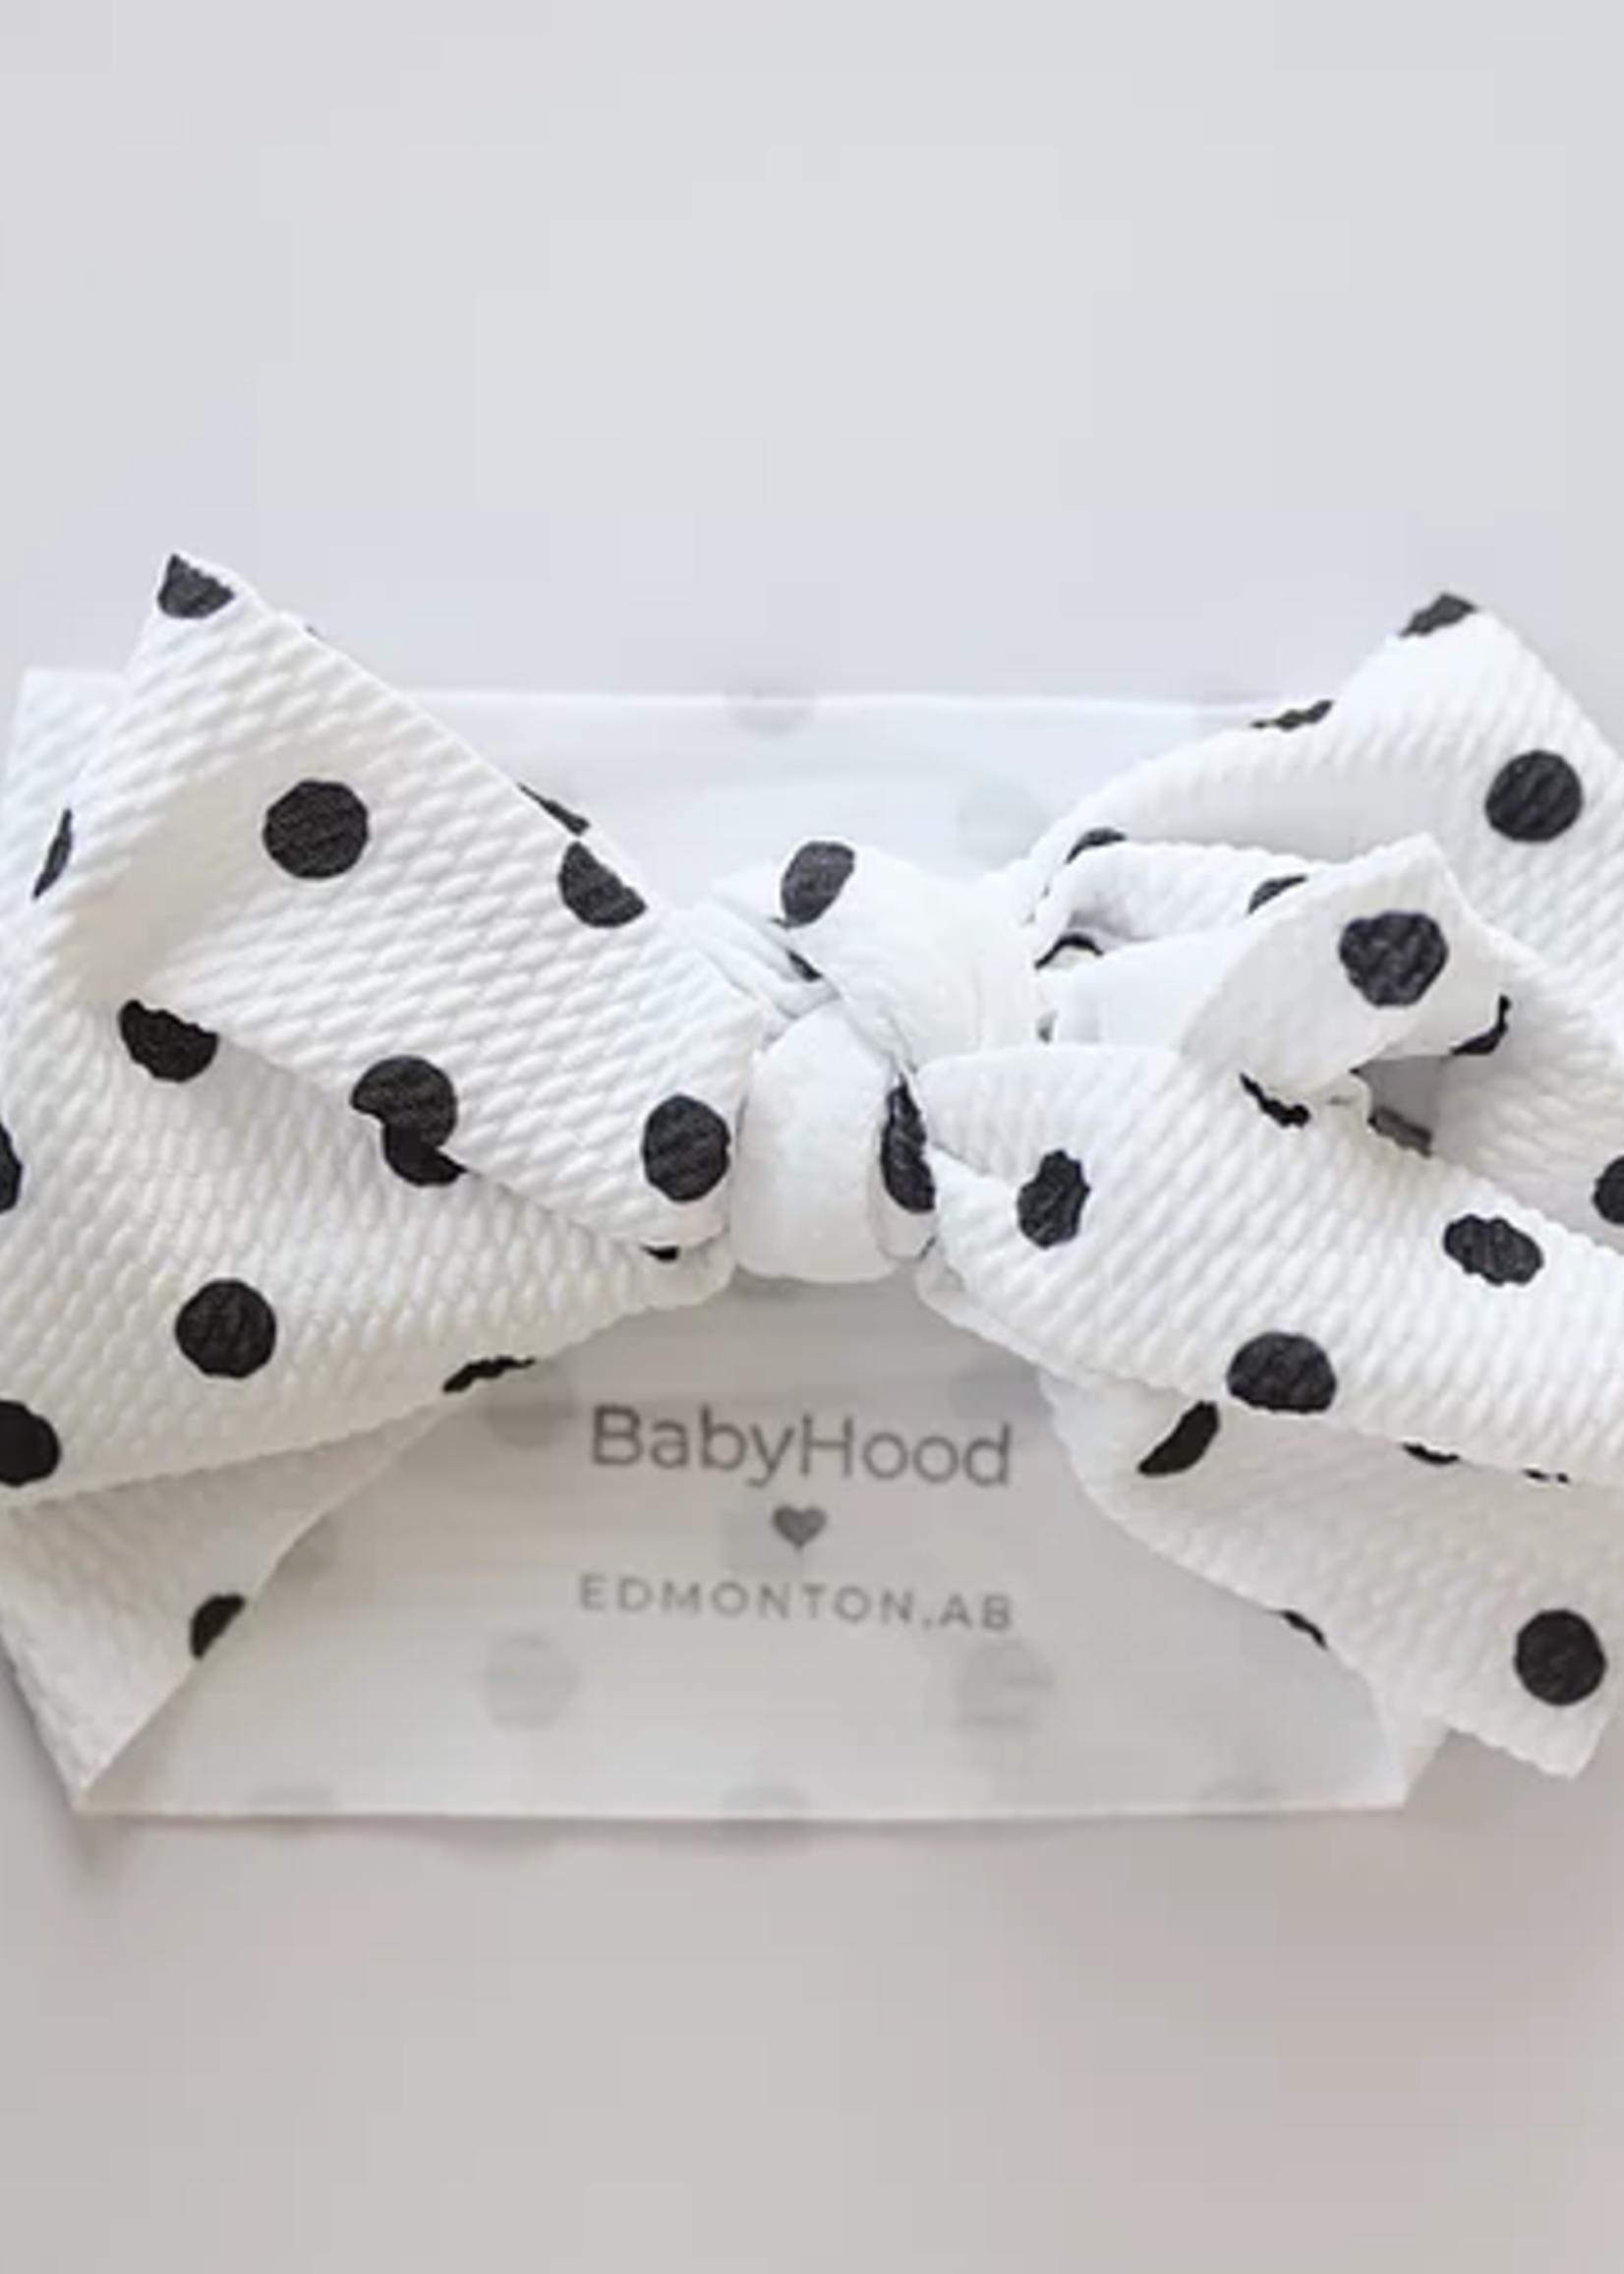 Baby Hood Baby Hood Big Bow Headband - Patterned